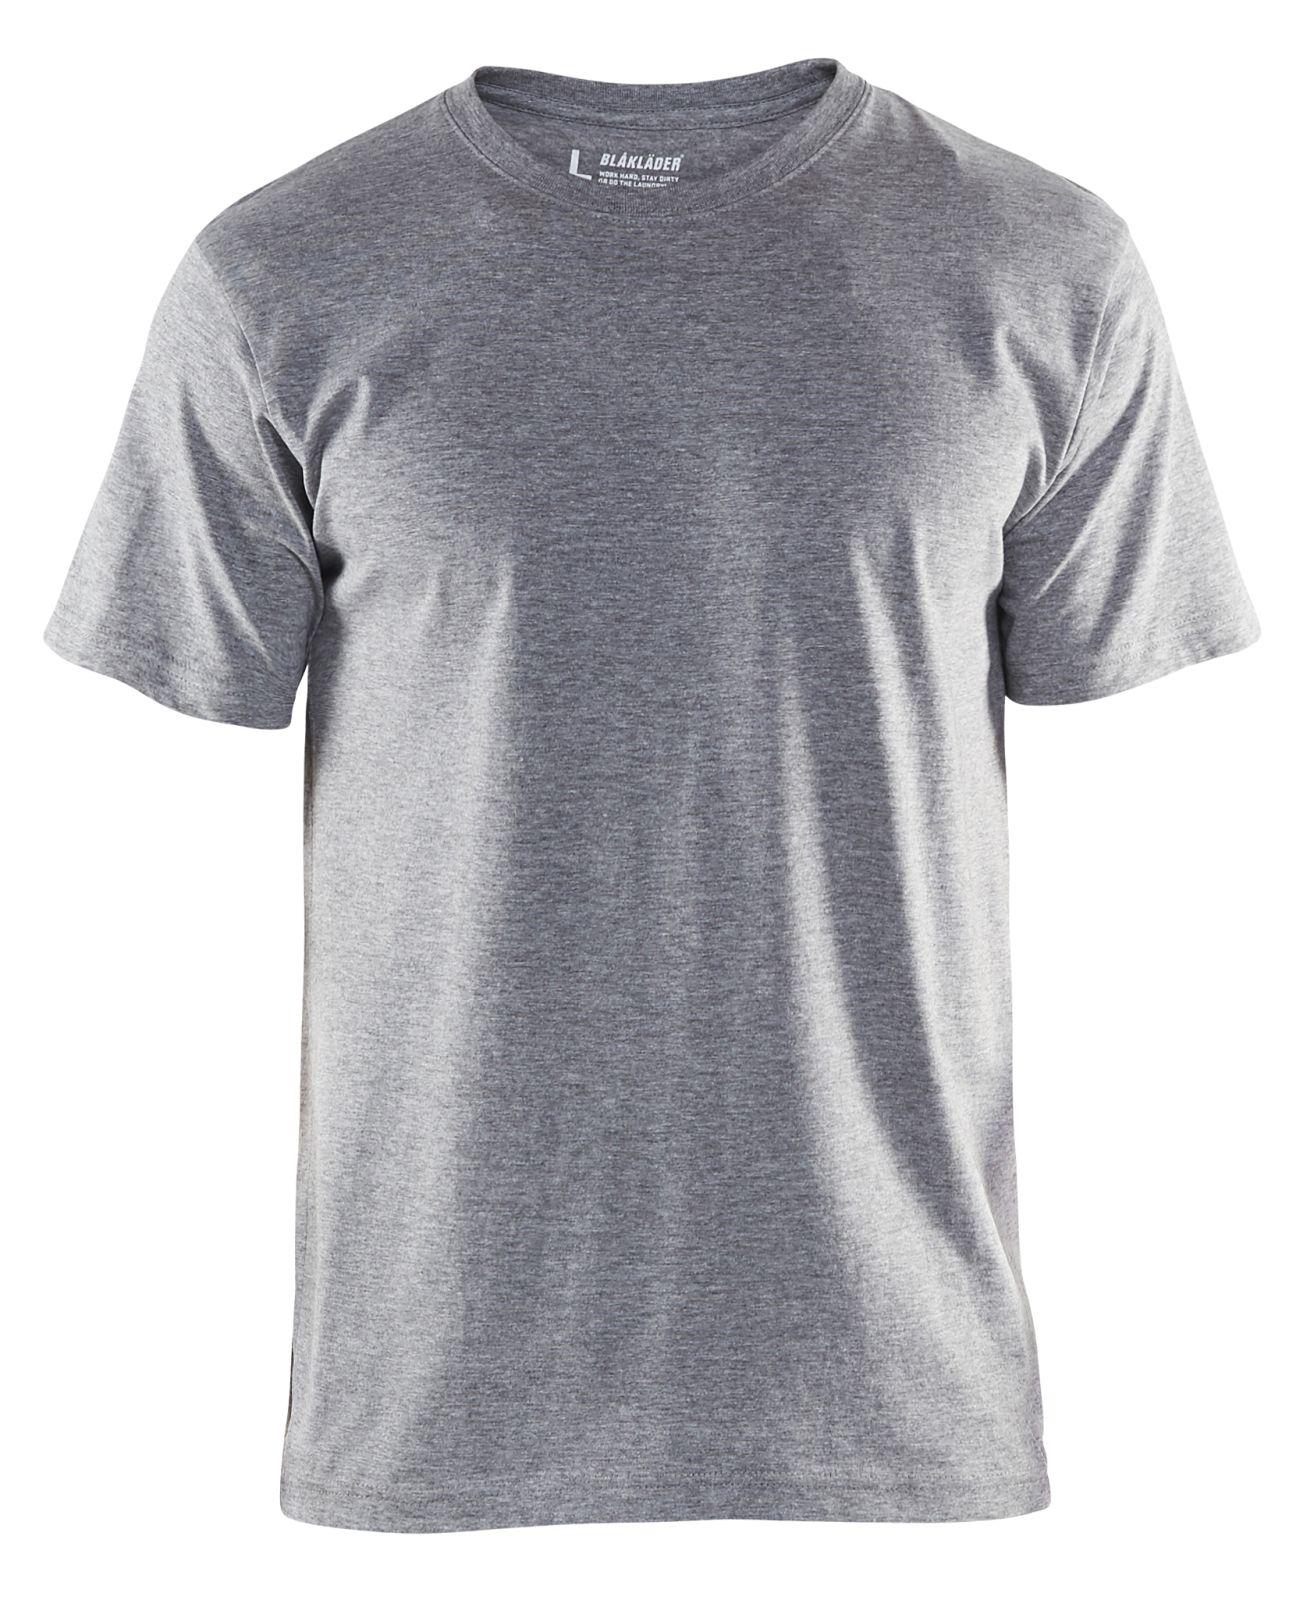 Blaklader T-shirts 33001033 grijs melee(9000)